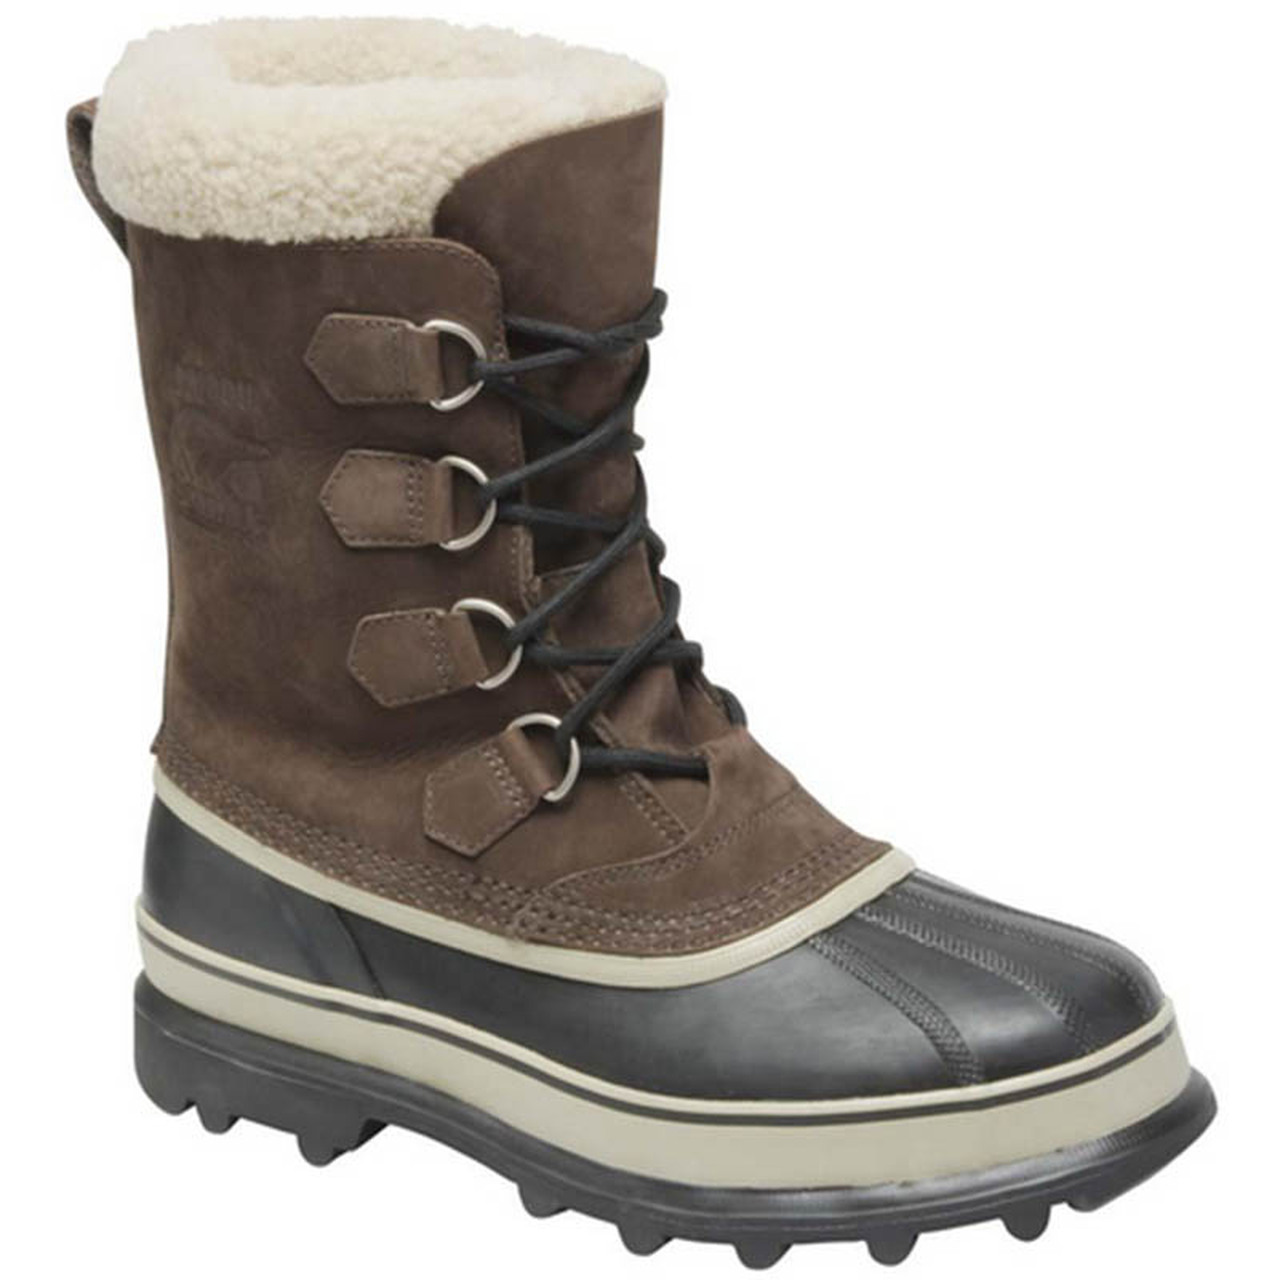 b6585b0b4c7d7 Sorel 1002871 Men s Caribou Bruno Winter Snow Boots - Family ...